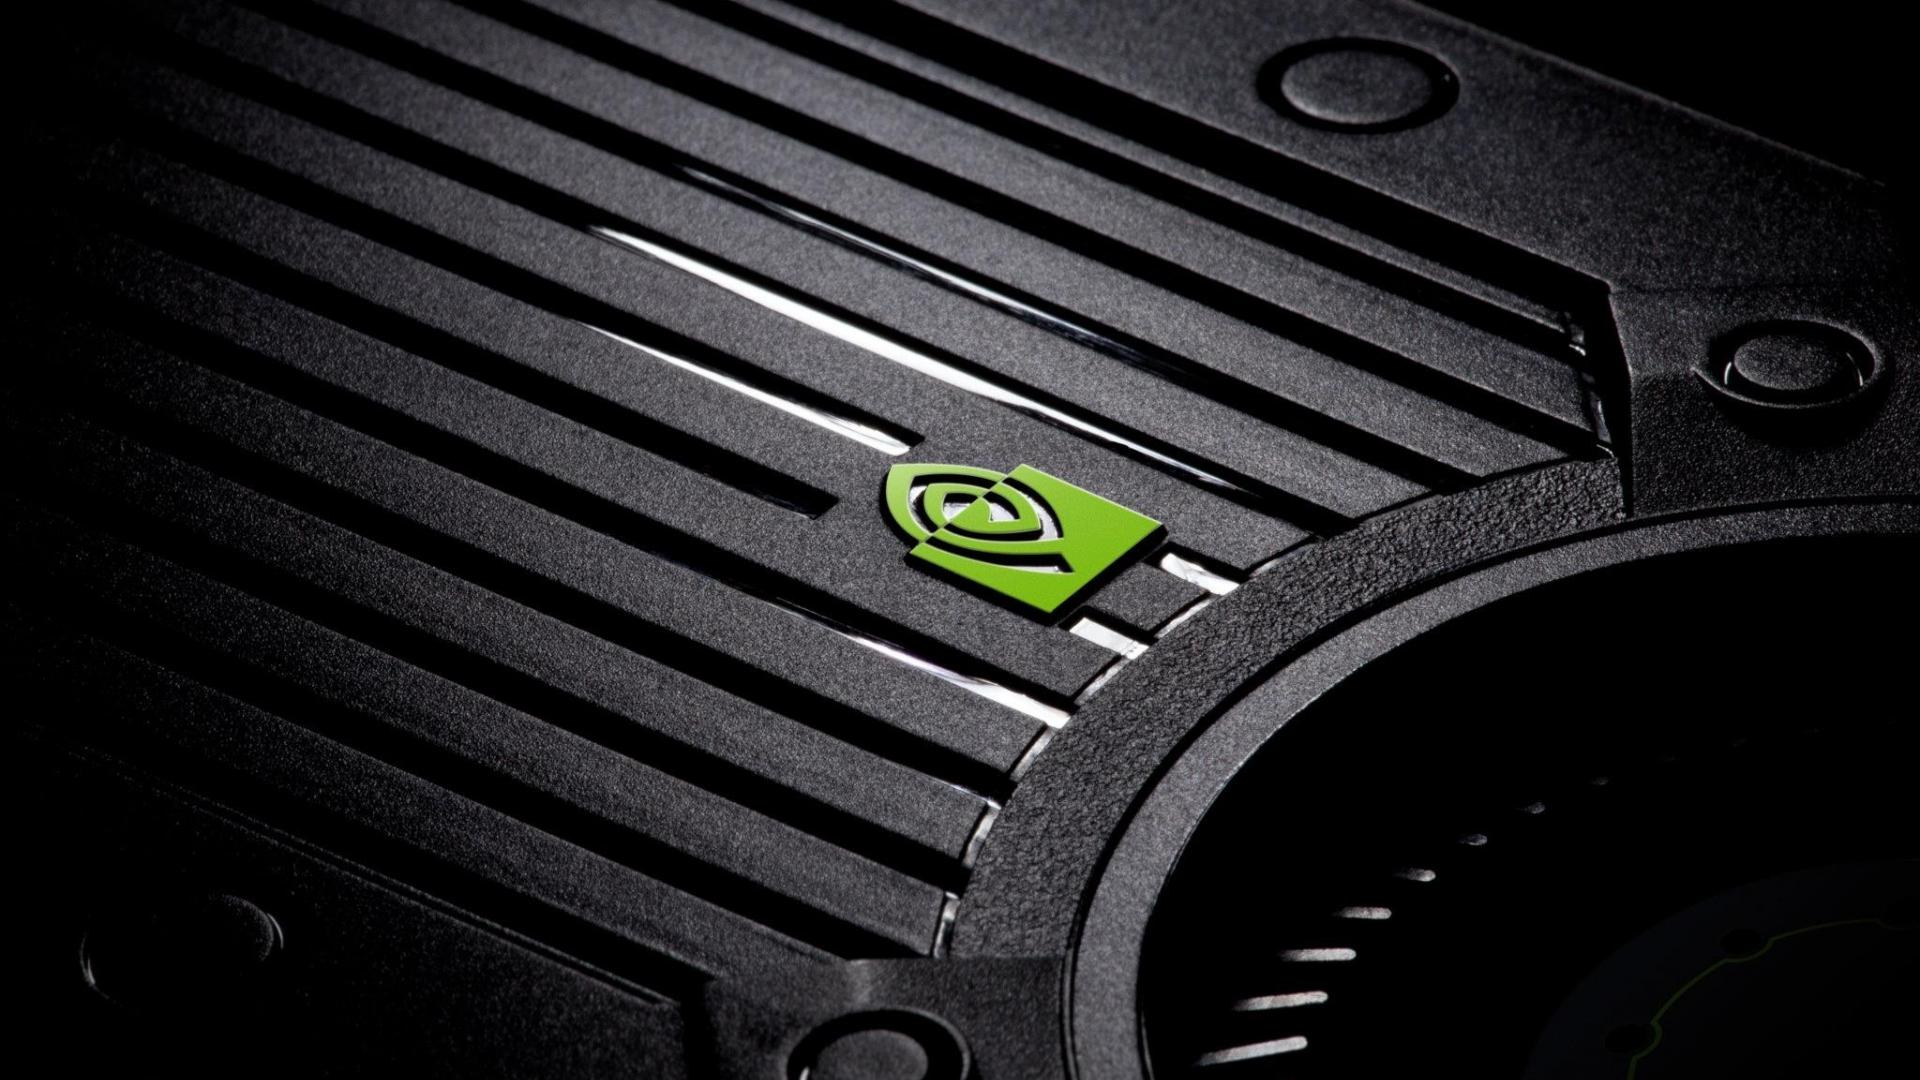 General 1920x1080 Nvidia Nvidia GTX GPU video card hardware